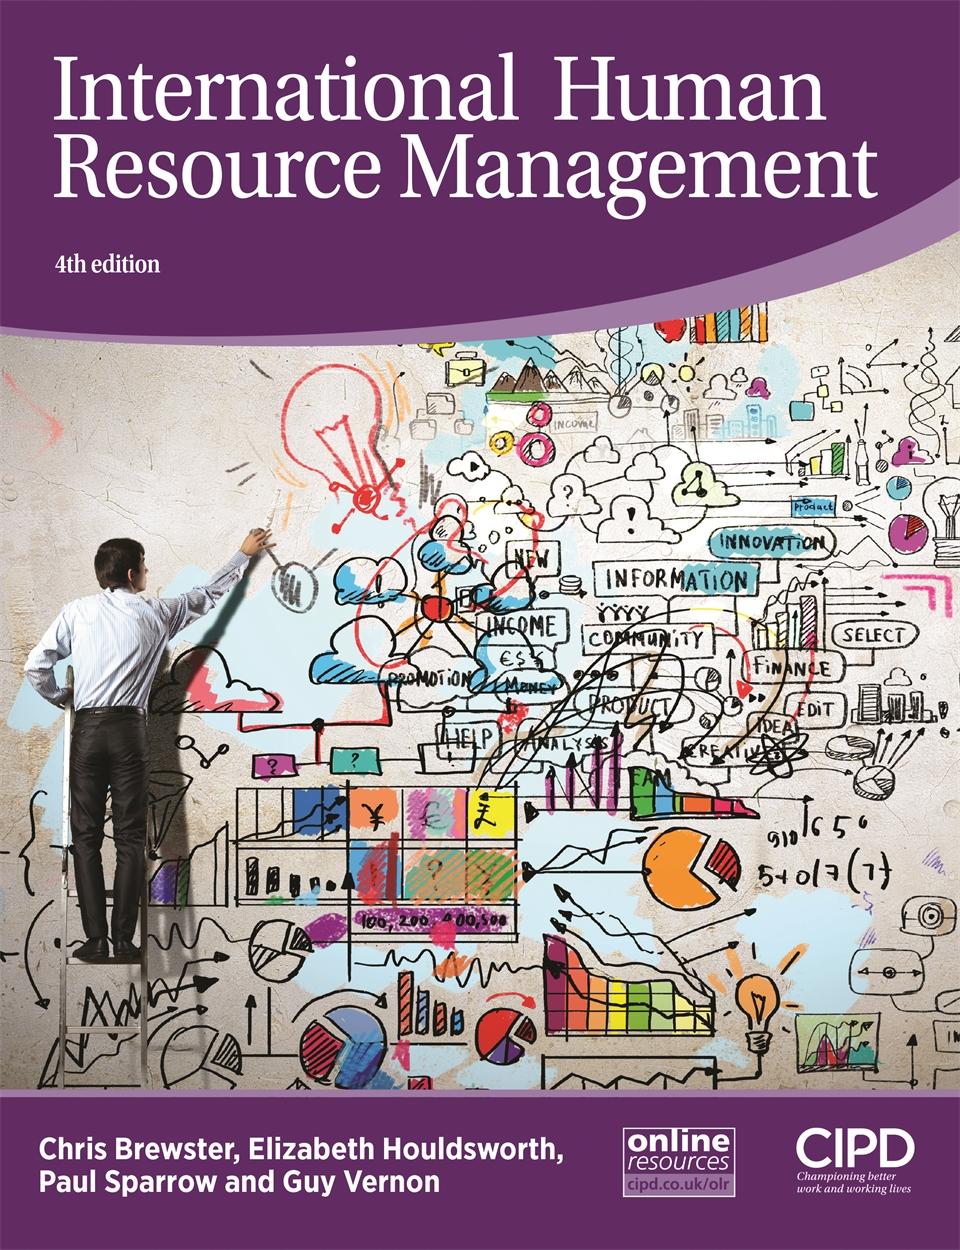 International Human Resource Management (9781843983750)